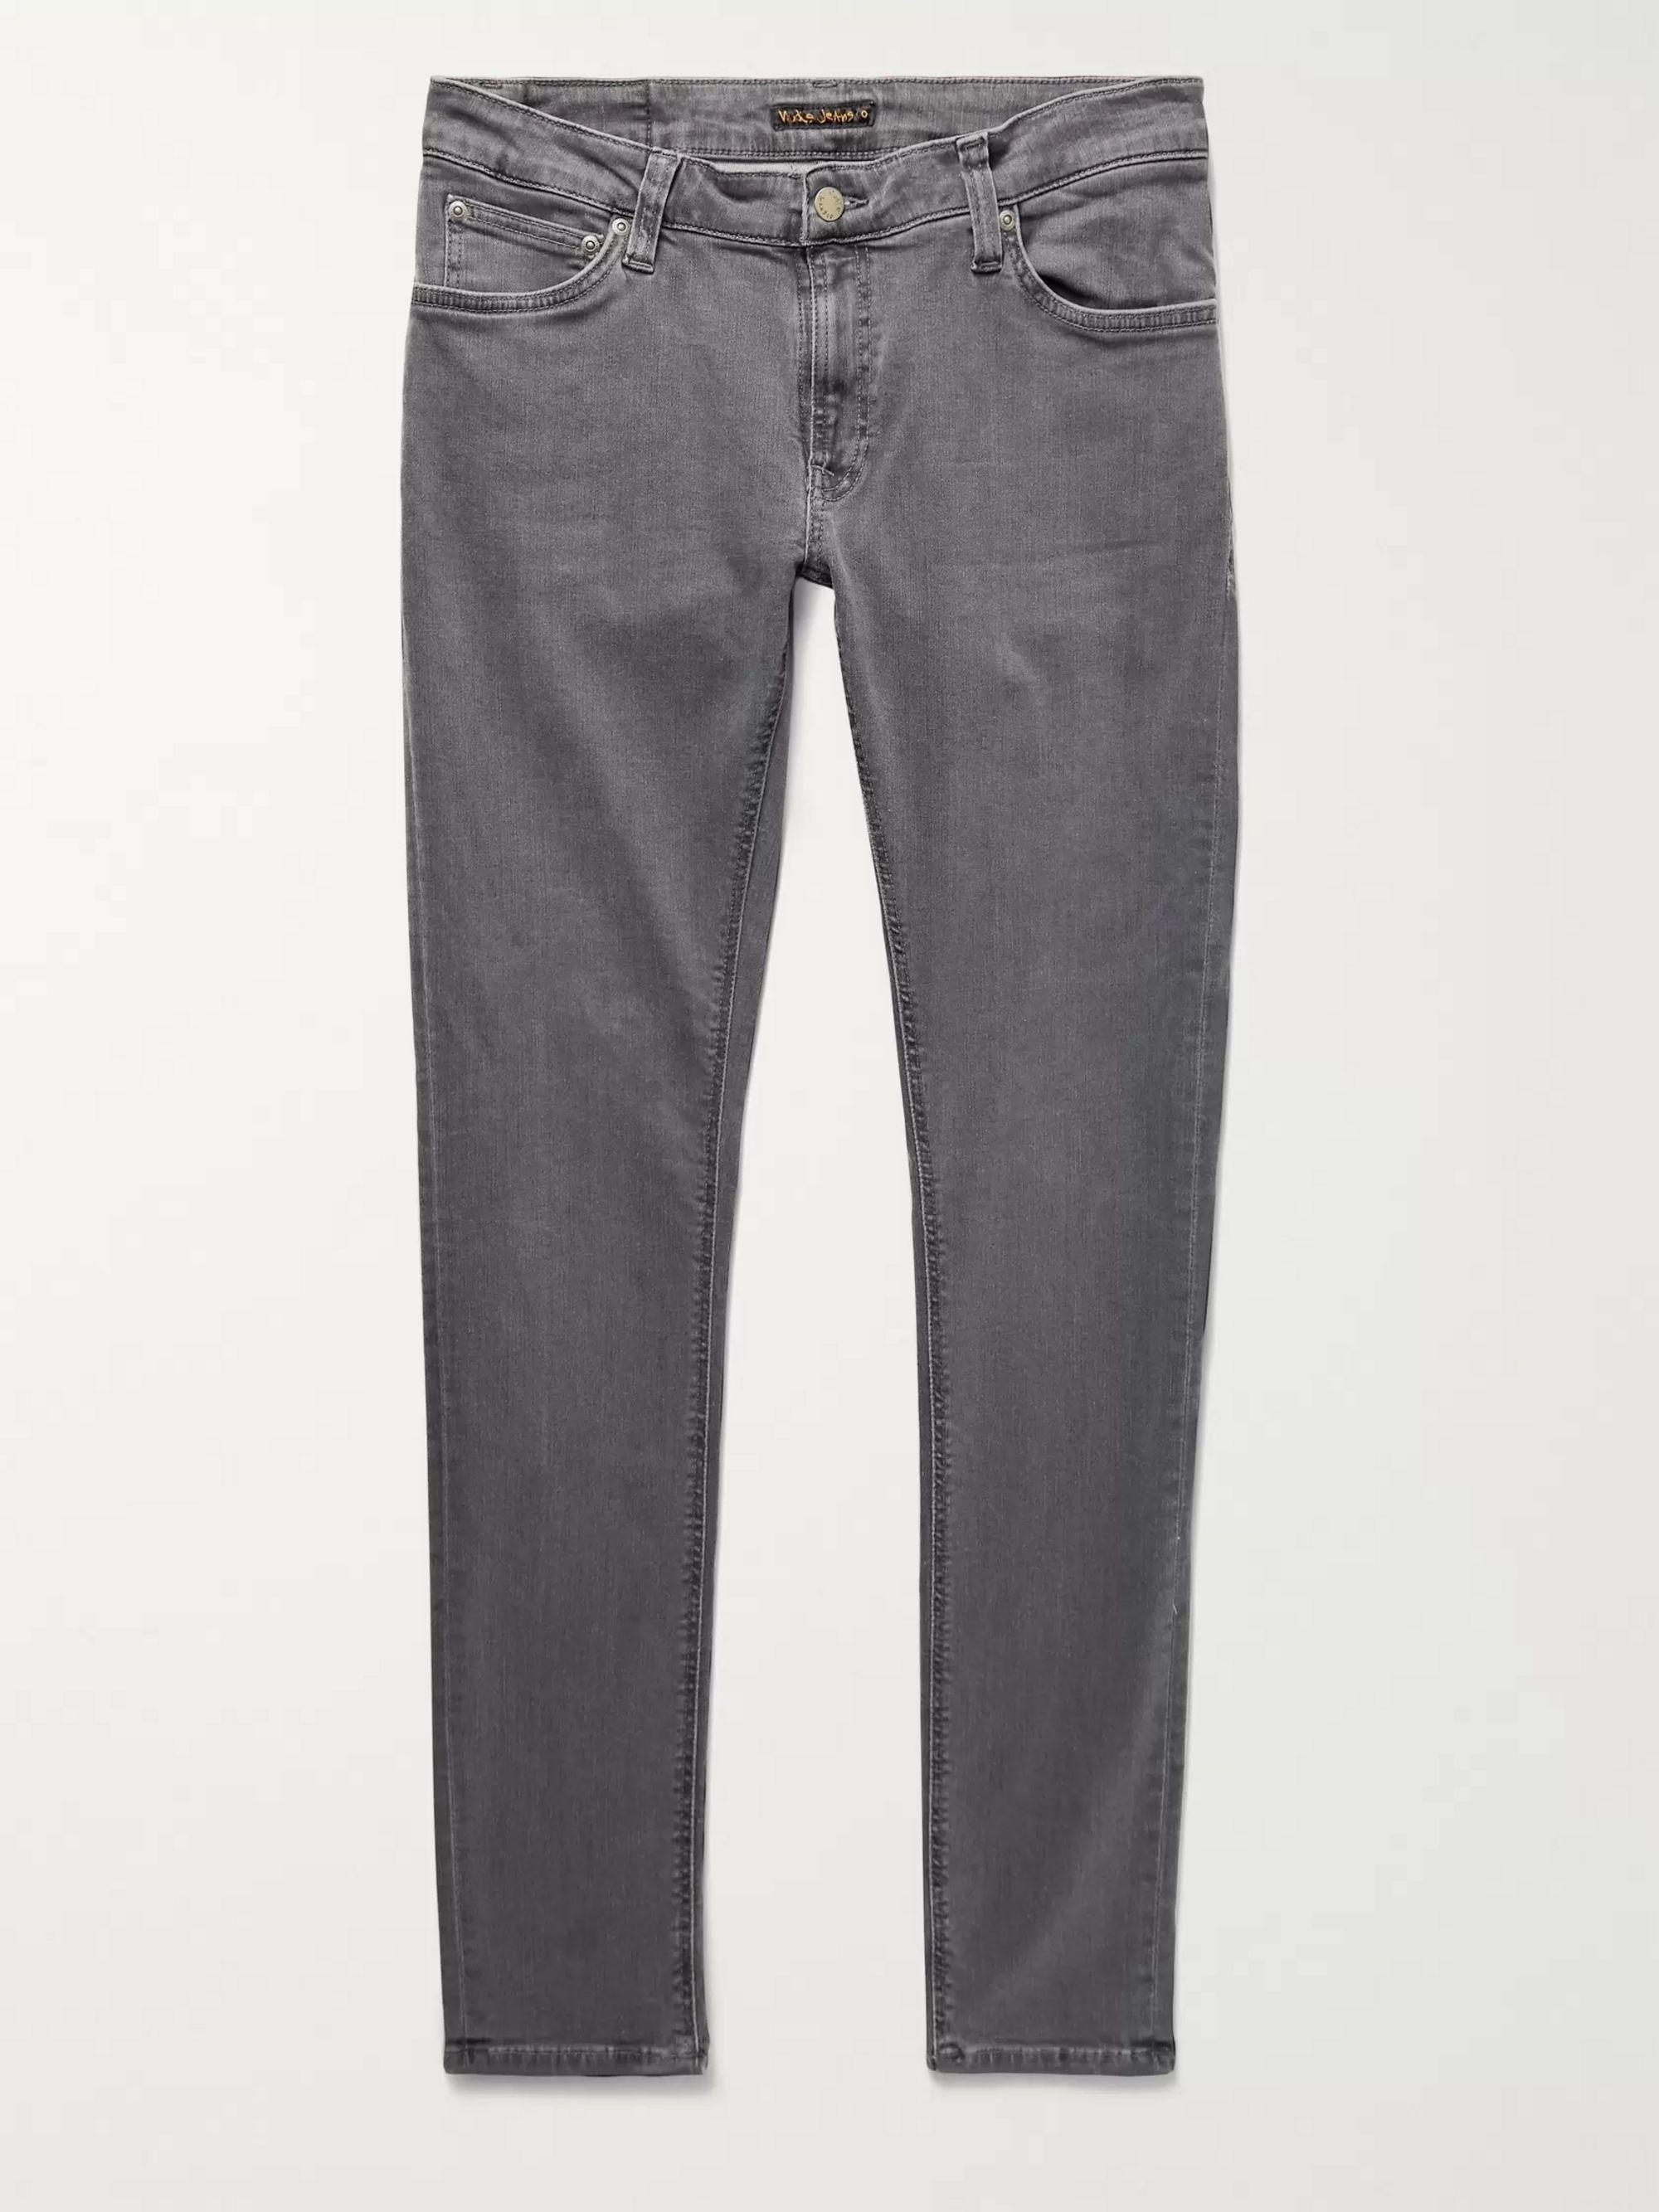 Nudie Jeans Gray Skinny Lin Organic Stretch-Denim Jeans,Gray